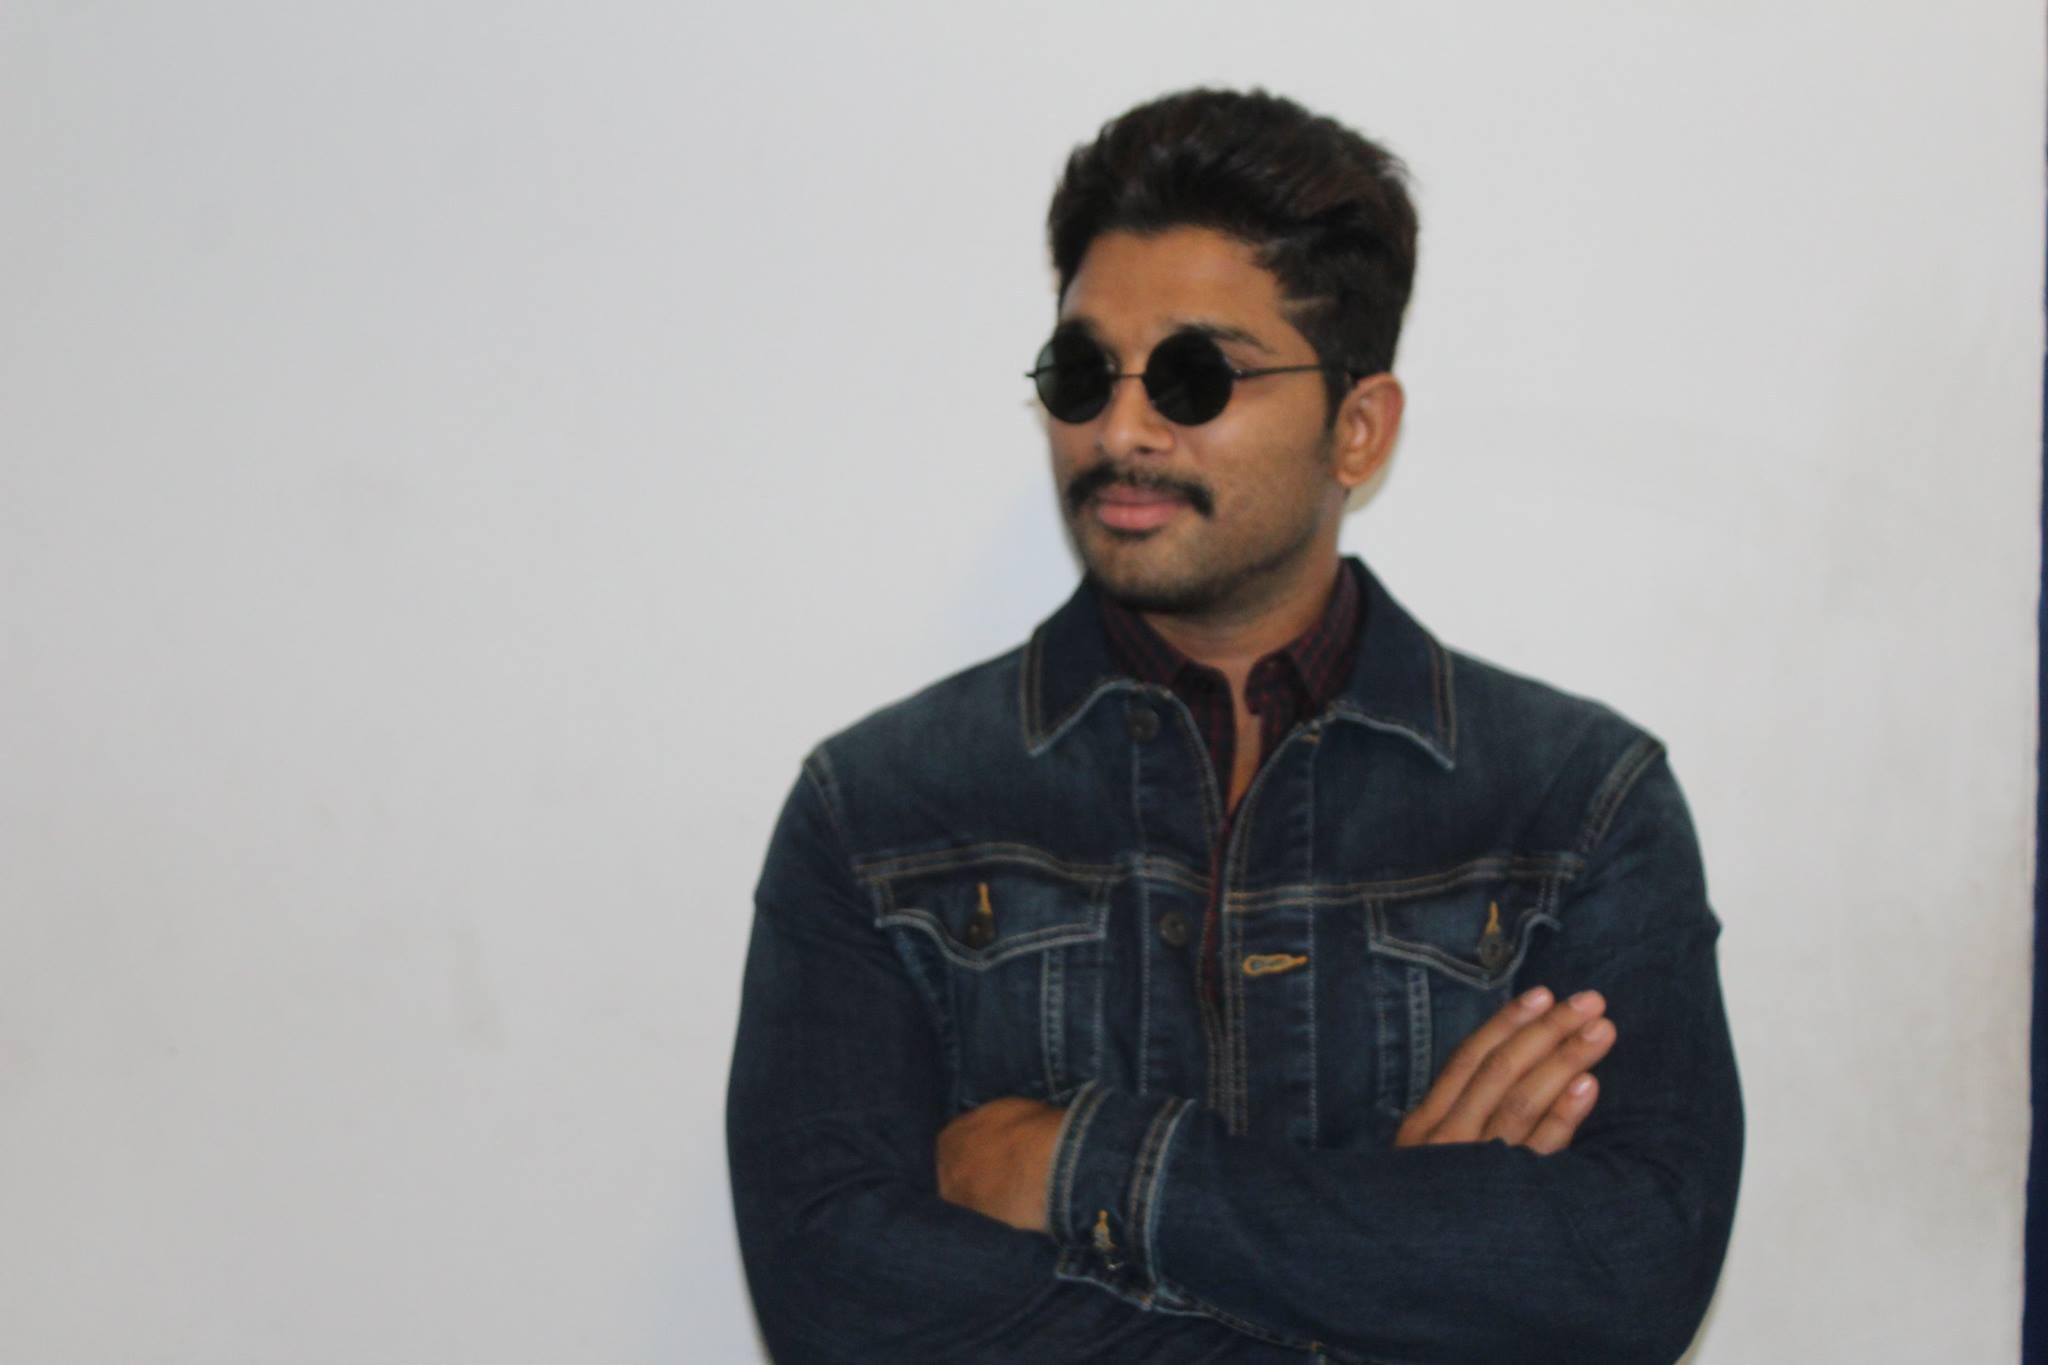 10-Allu-Arjun-Latest-New-HD-Photos-Stylish-Star-ULTRA-HD-Images-Bunny ...